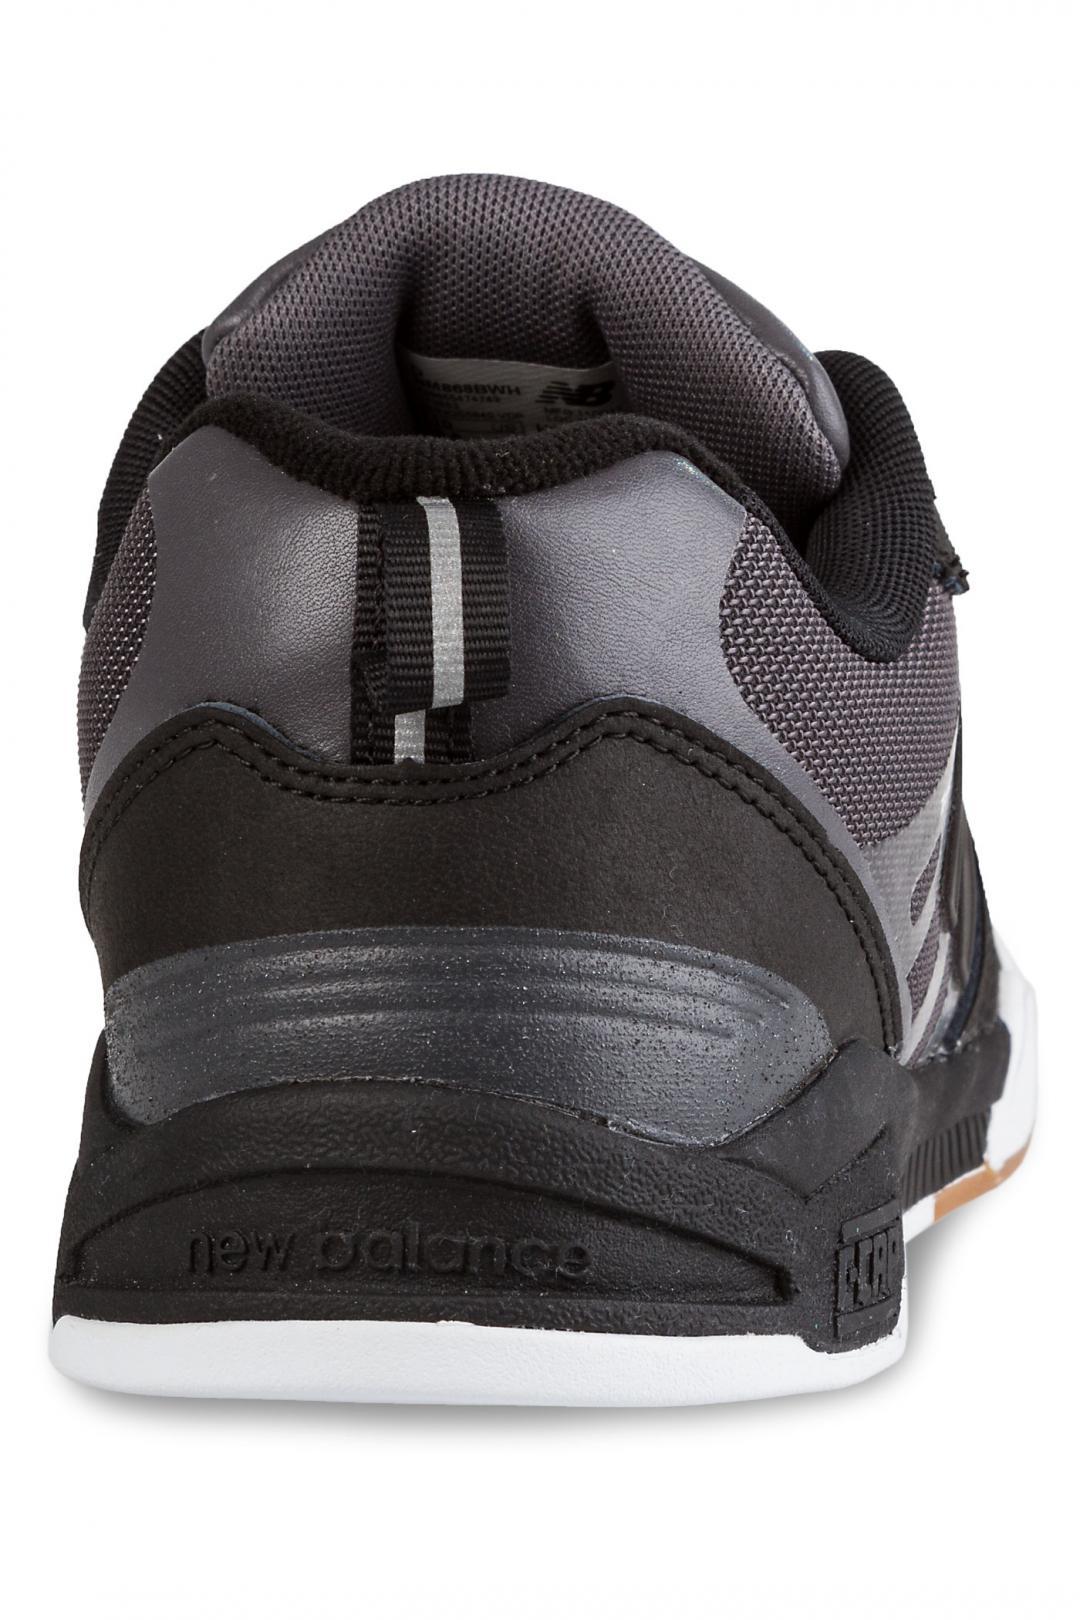 Uomo New Balance Numeric 868 black grey   Scarpe da skate